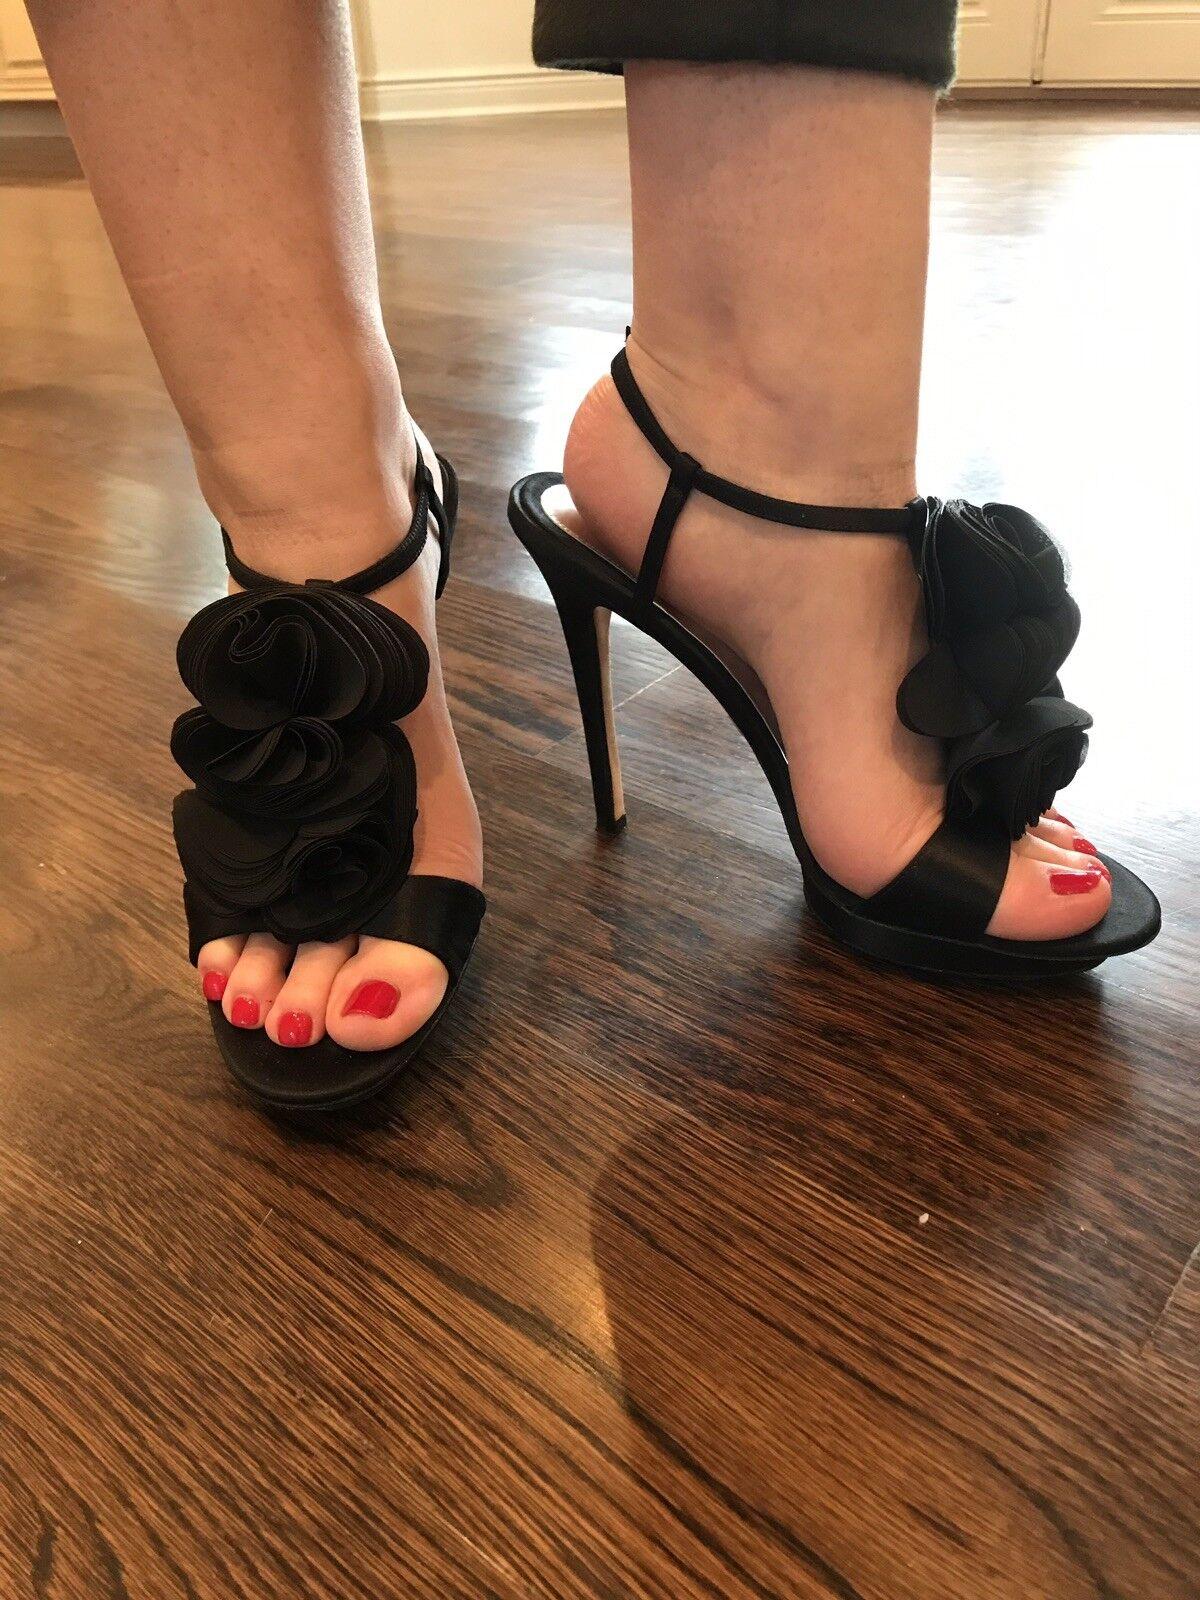 Badgley Mischka Mischka Mischka Black Satin T Strap Platform Heels Sandles Size 10 ed4a8b